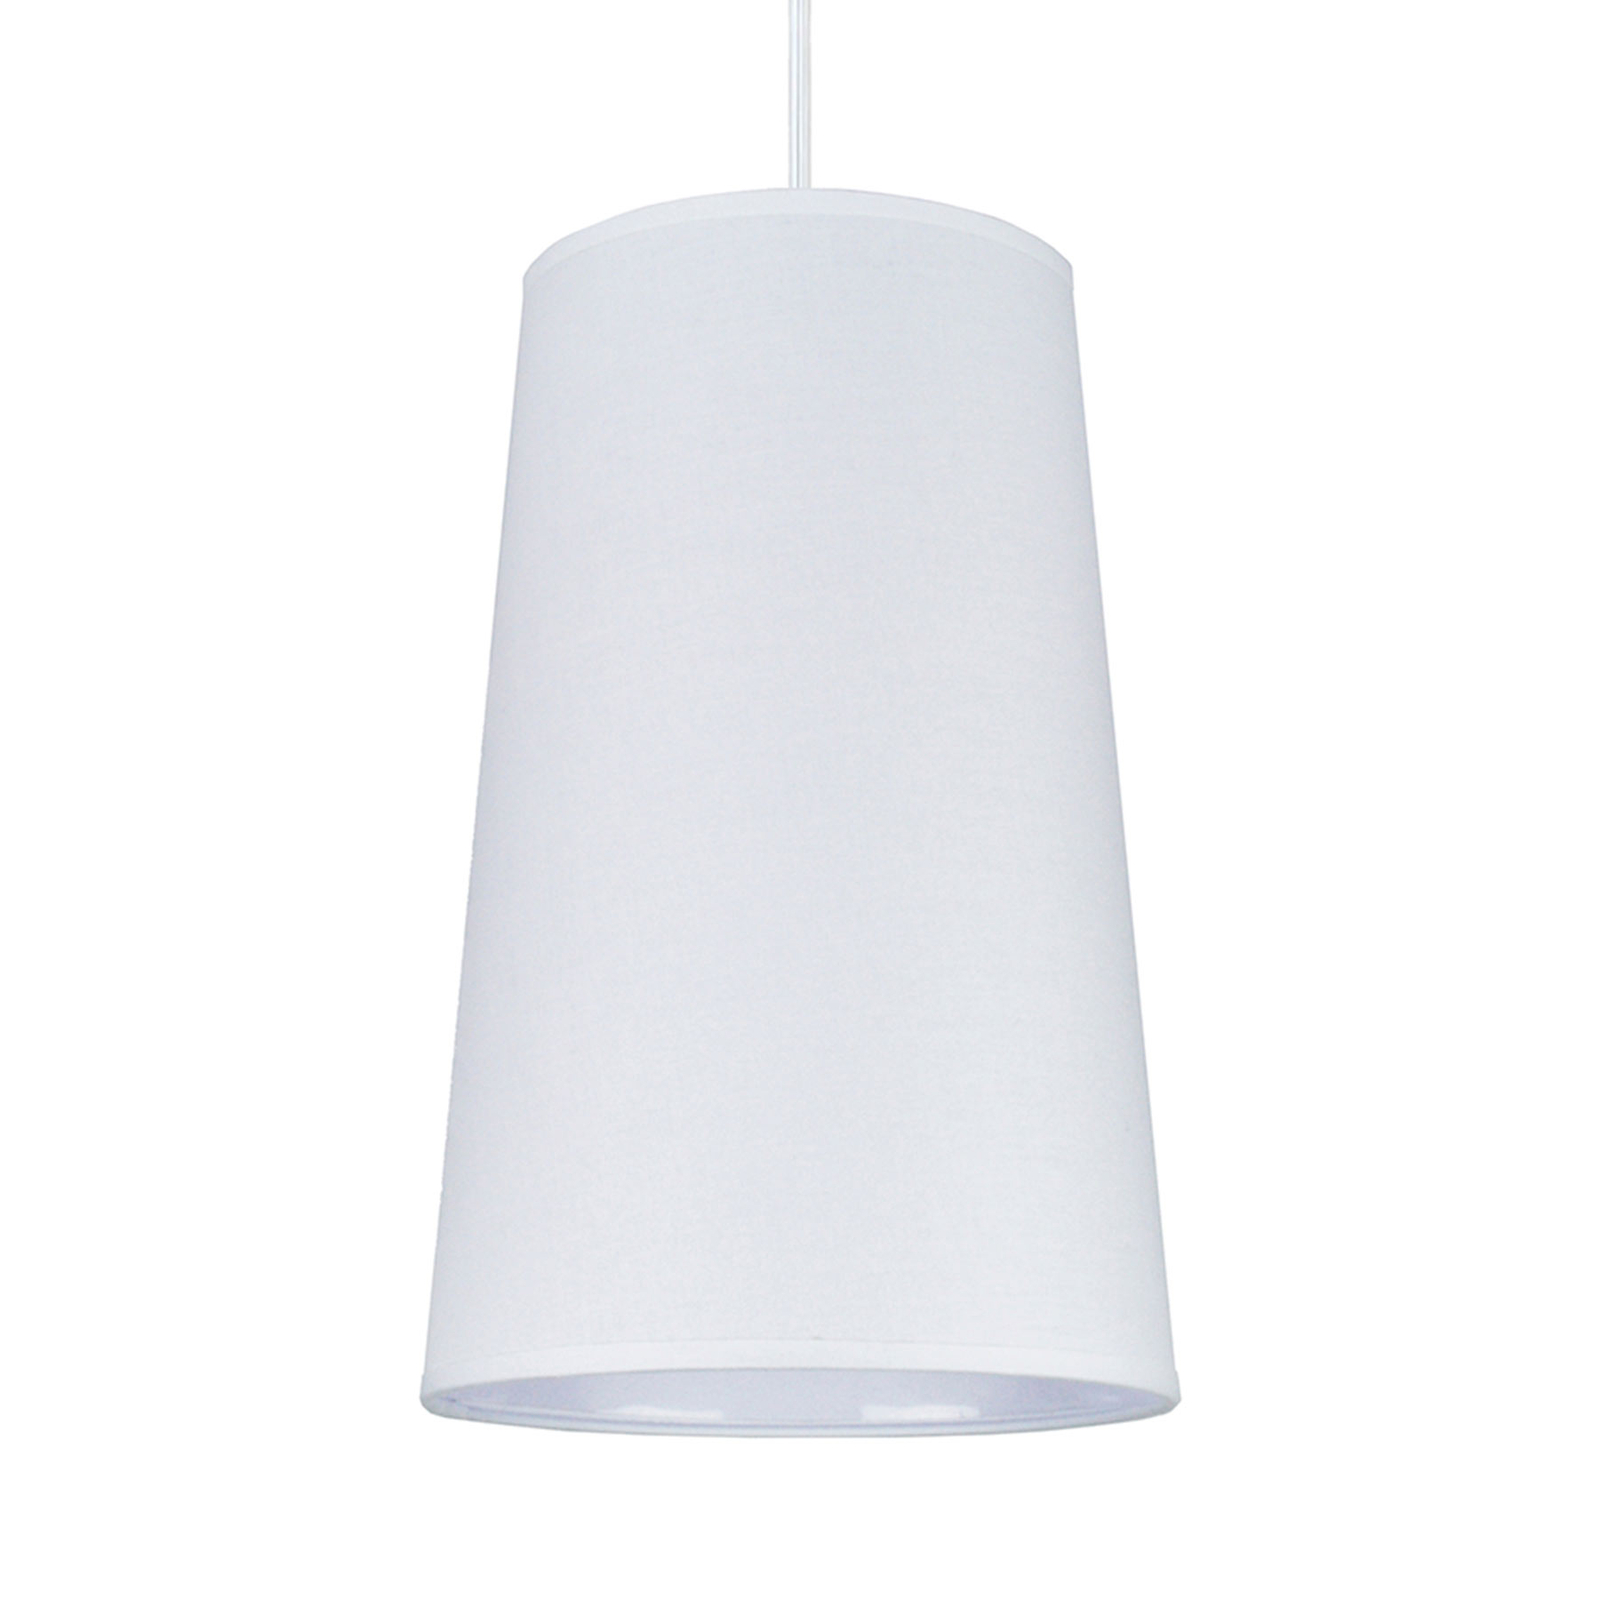 Hanglamp Soul, wit